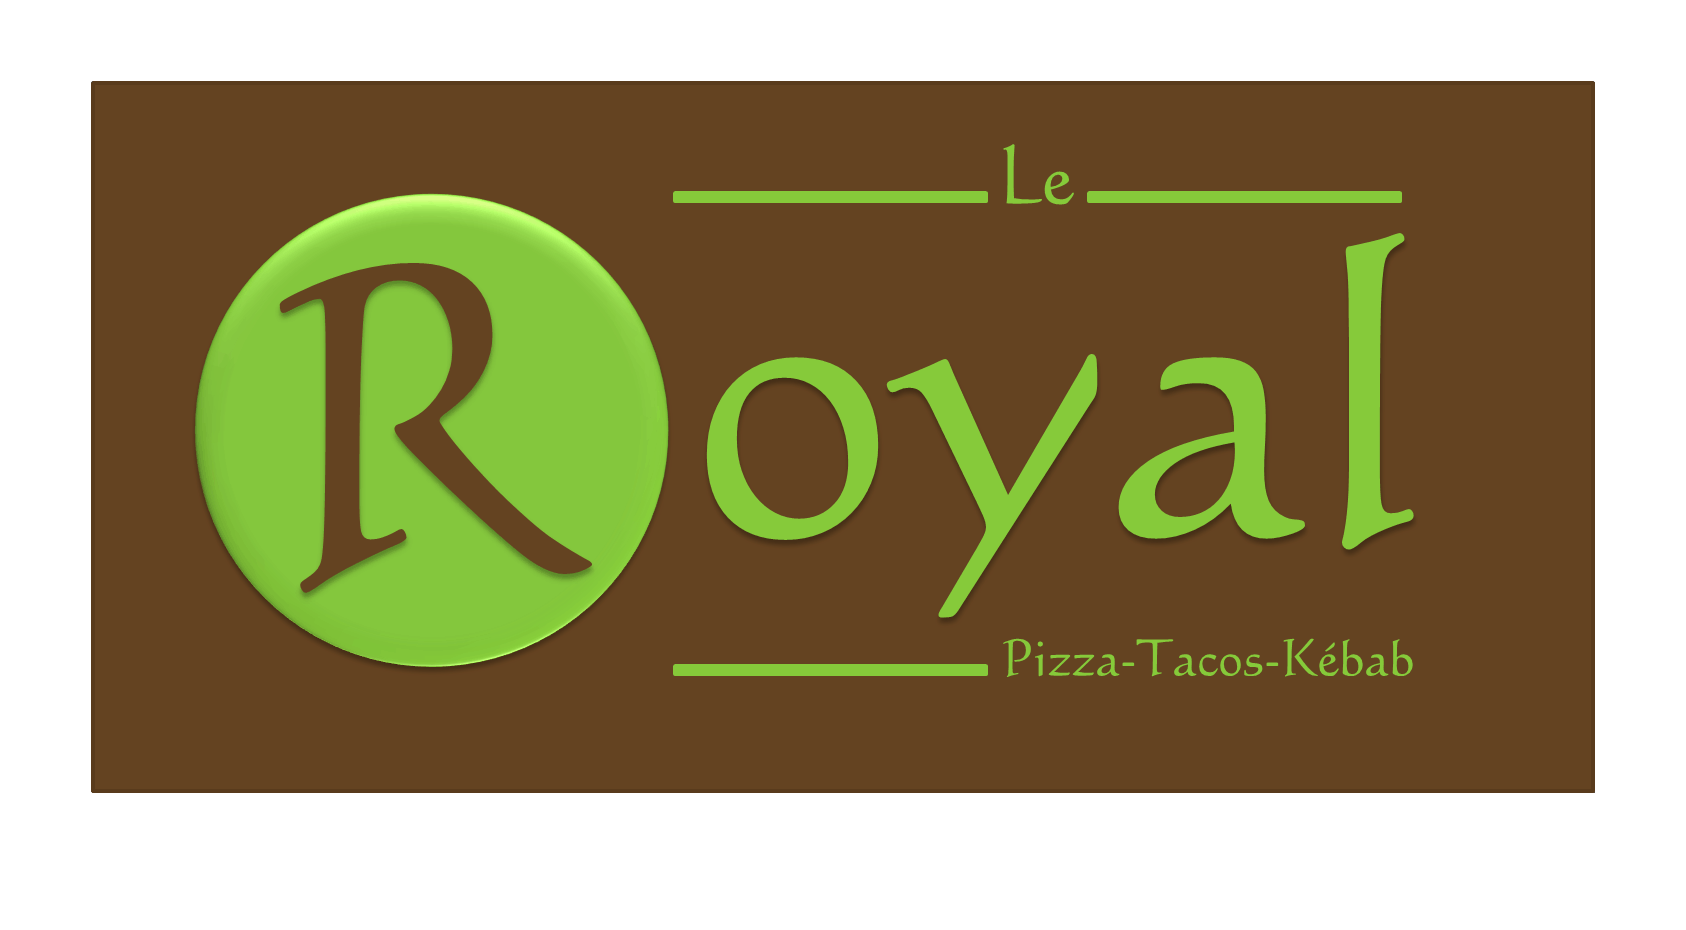 Le Royal Pizza Tacos Kébab